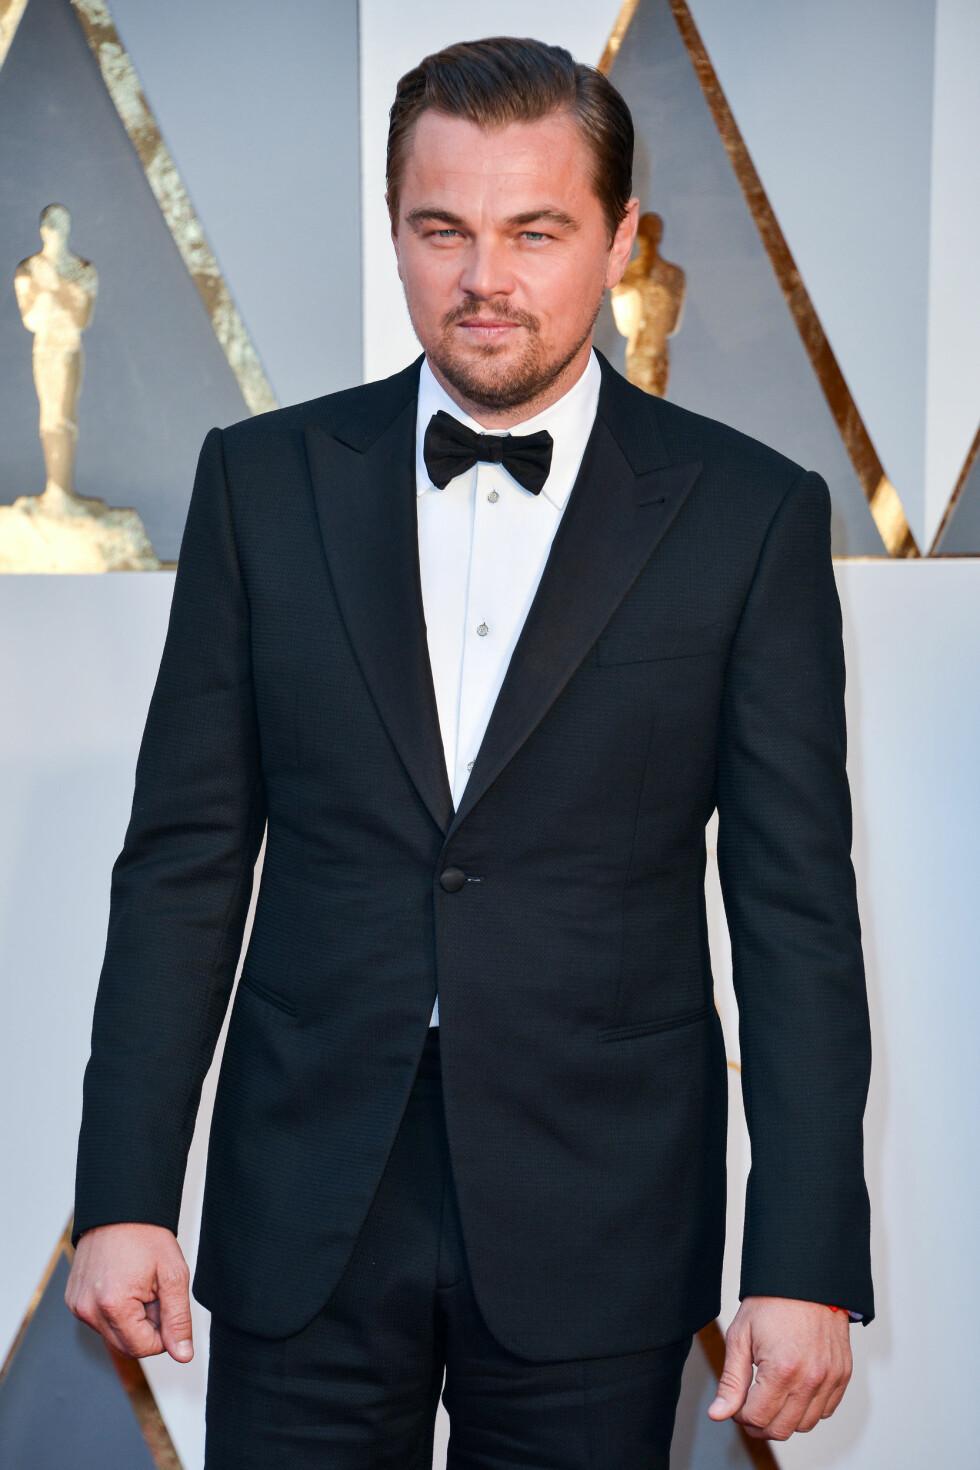 ALDRI VÆRT GIFT: Skuespiller Leonardo DiCaprio (41). Foto: NTB Scanpix